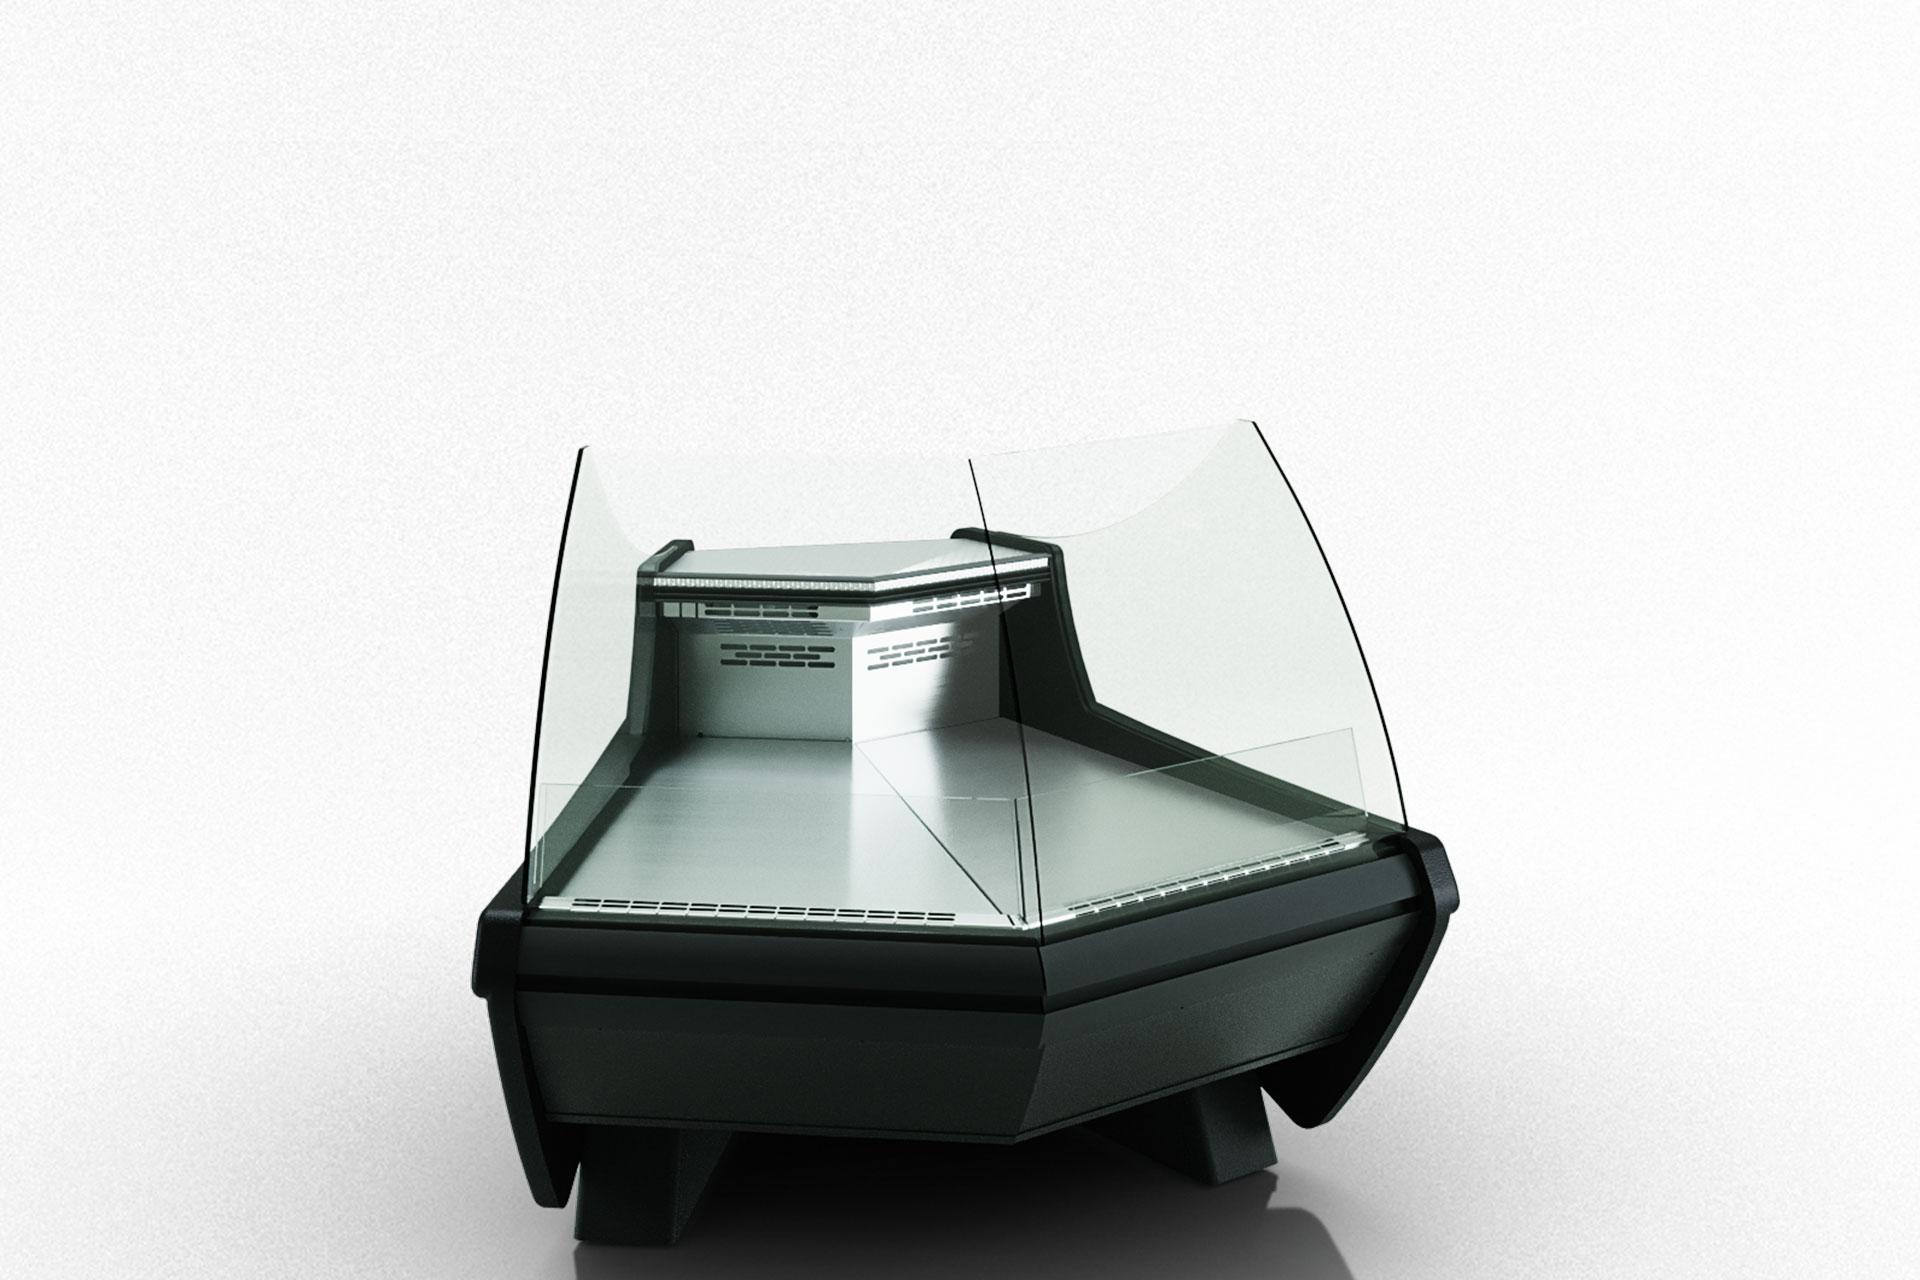 Kühlvitrinen Symphony luxe MG 100 deli T2 110-DLM-ES45